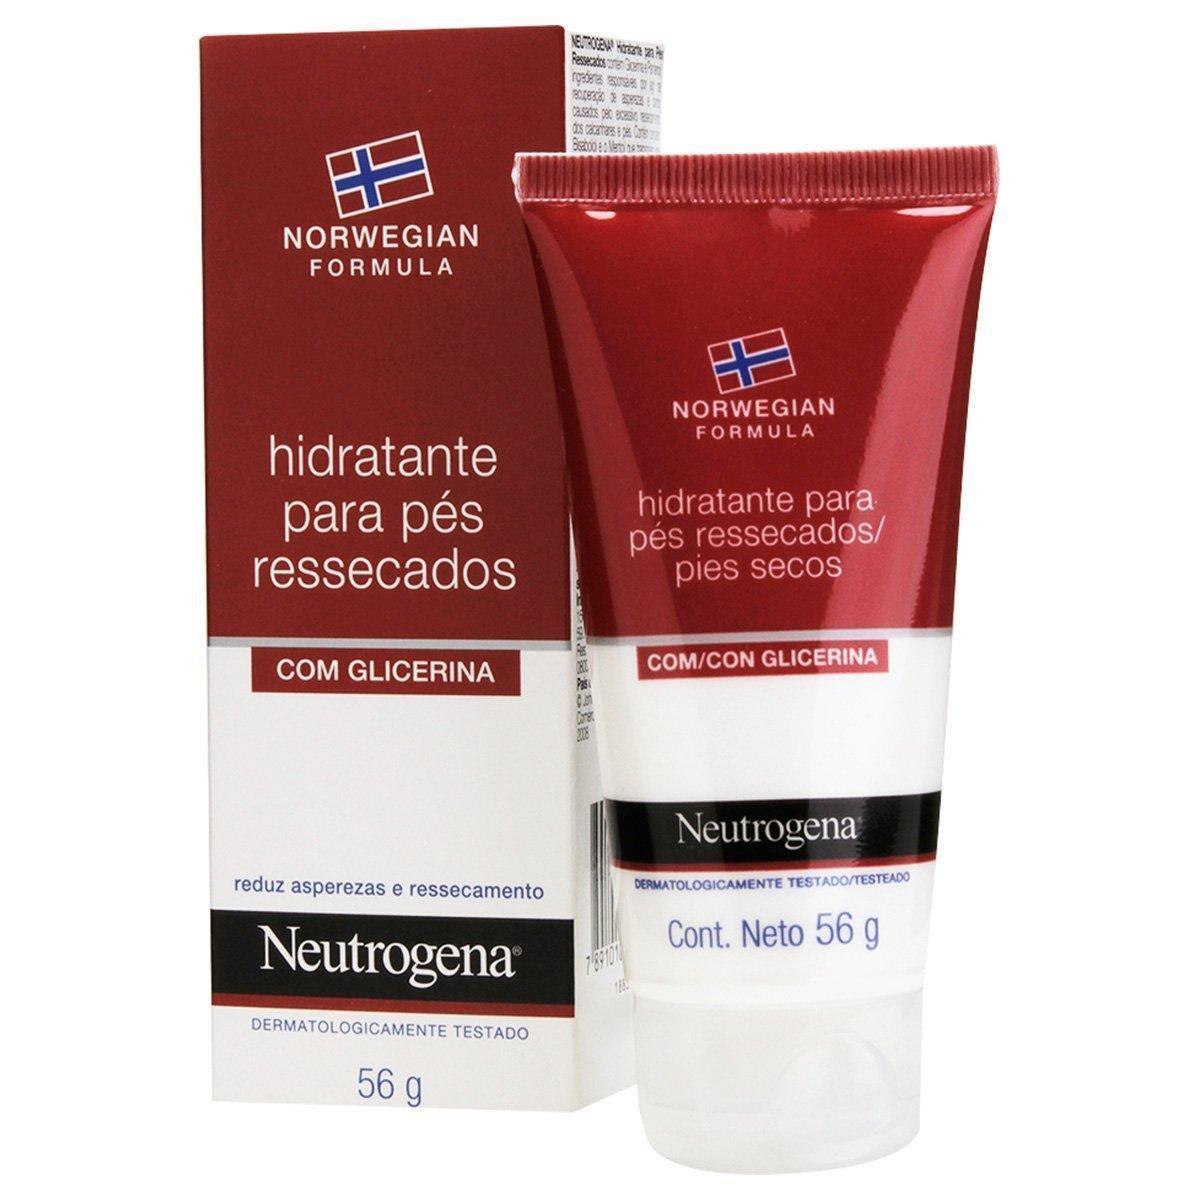 Creme Hidratante para os Pés Neutrogena Norwegian 56g